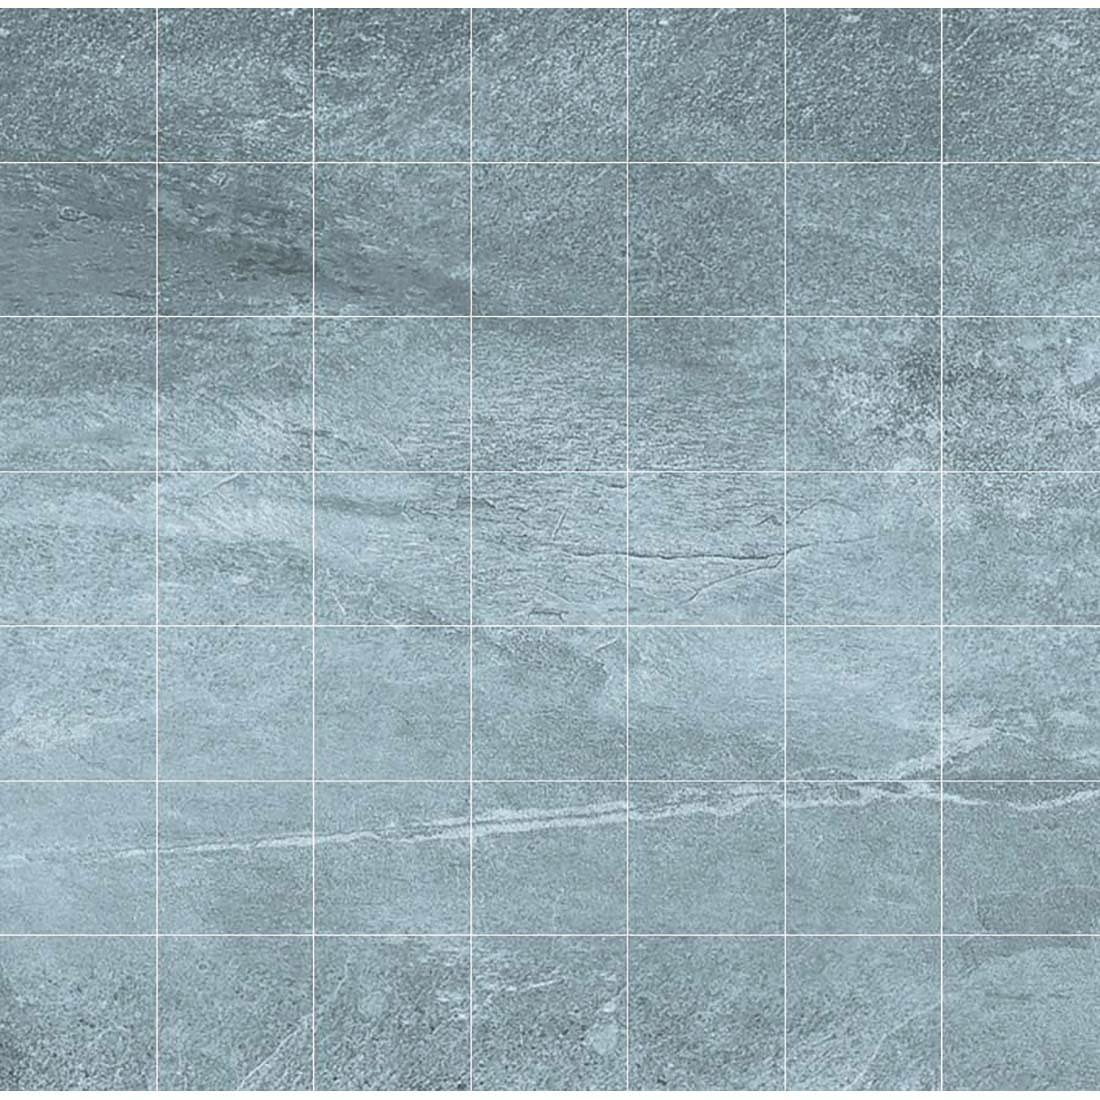 Delta Mosaic 33x33 Dark Grey Matt 1